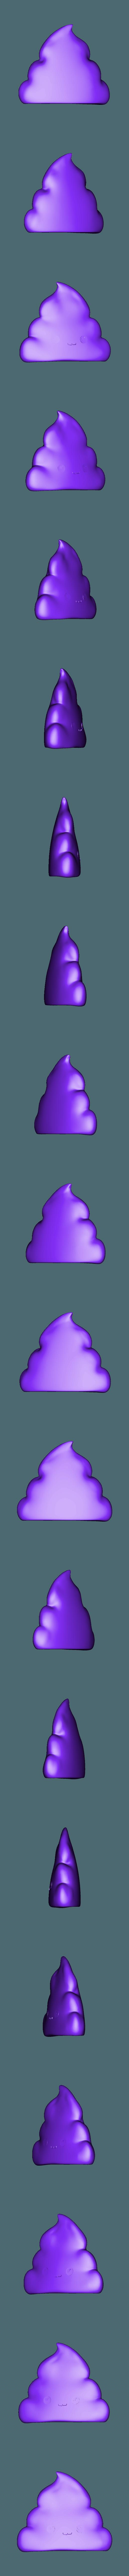 caca.OBJ Download free OBJ file Caca - emoji - shit - popo • 3D print design, Paola23